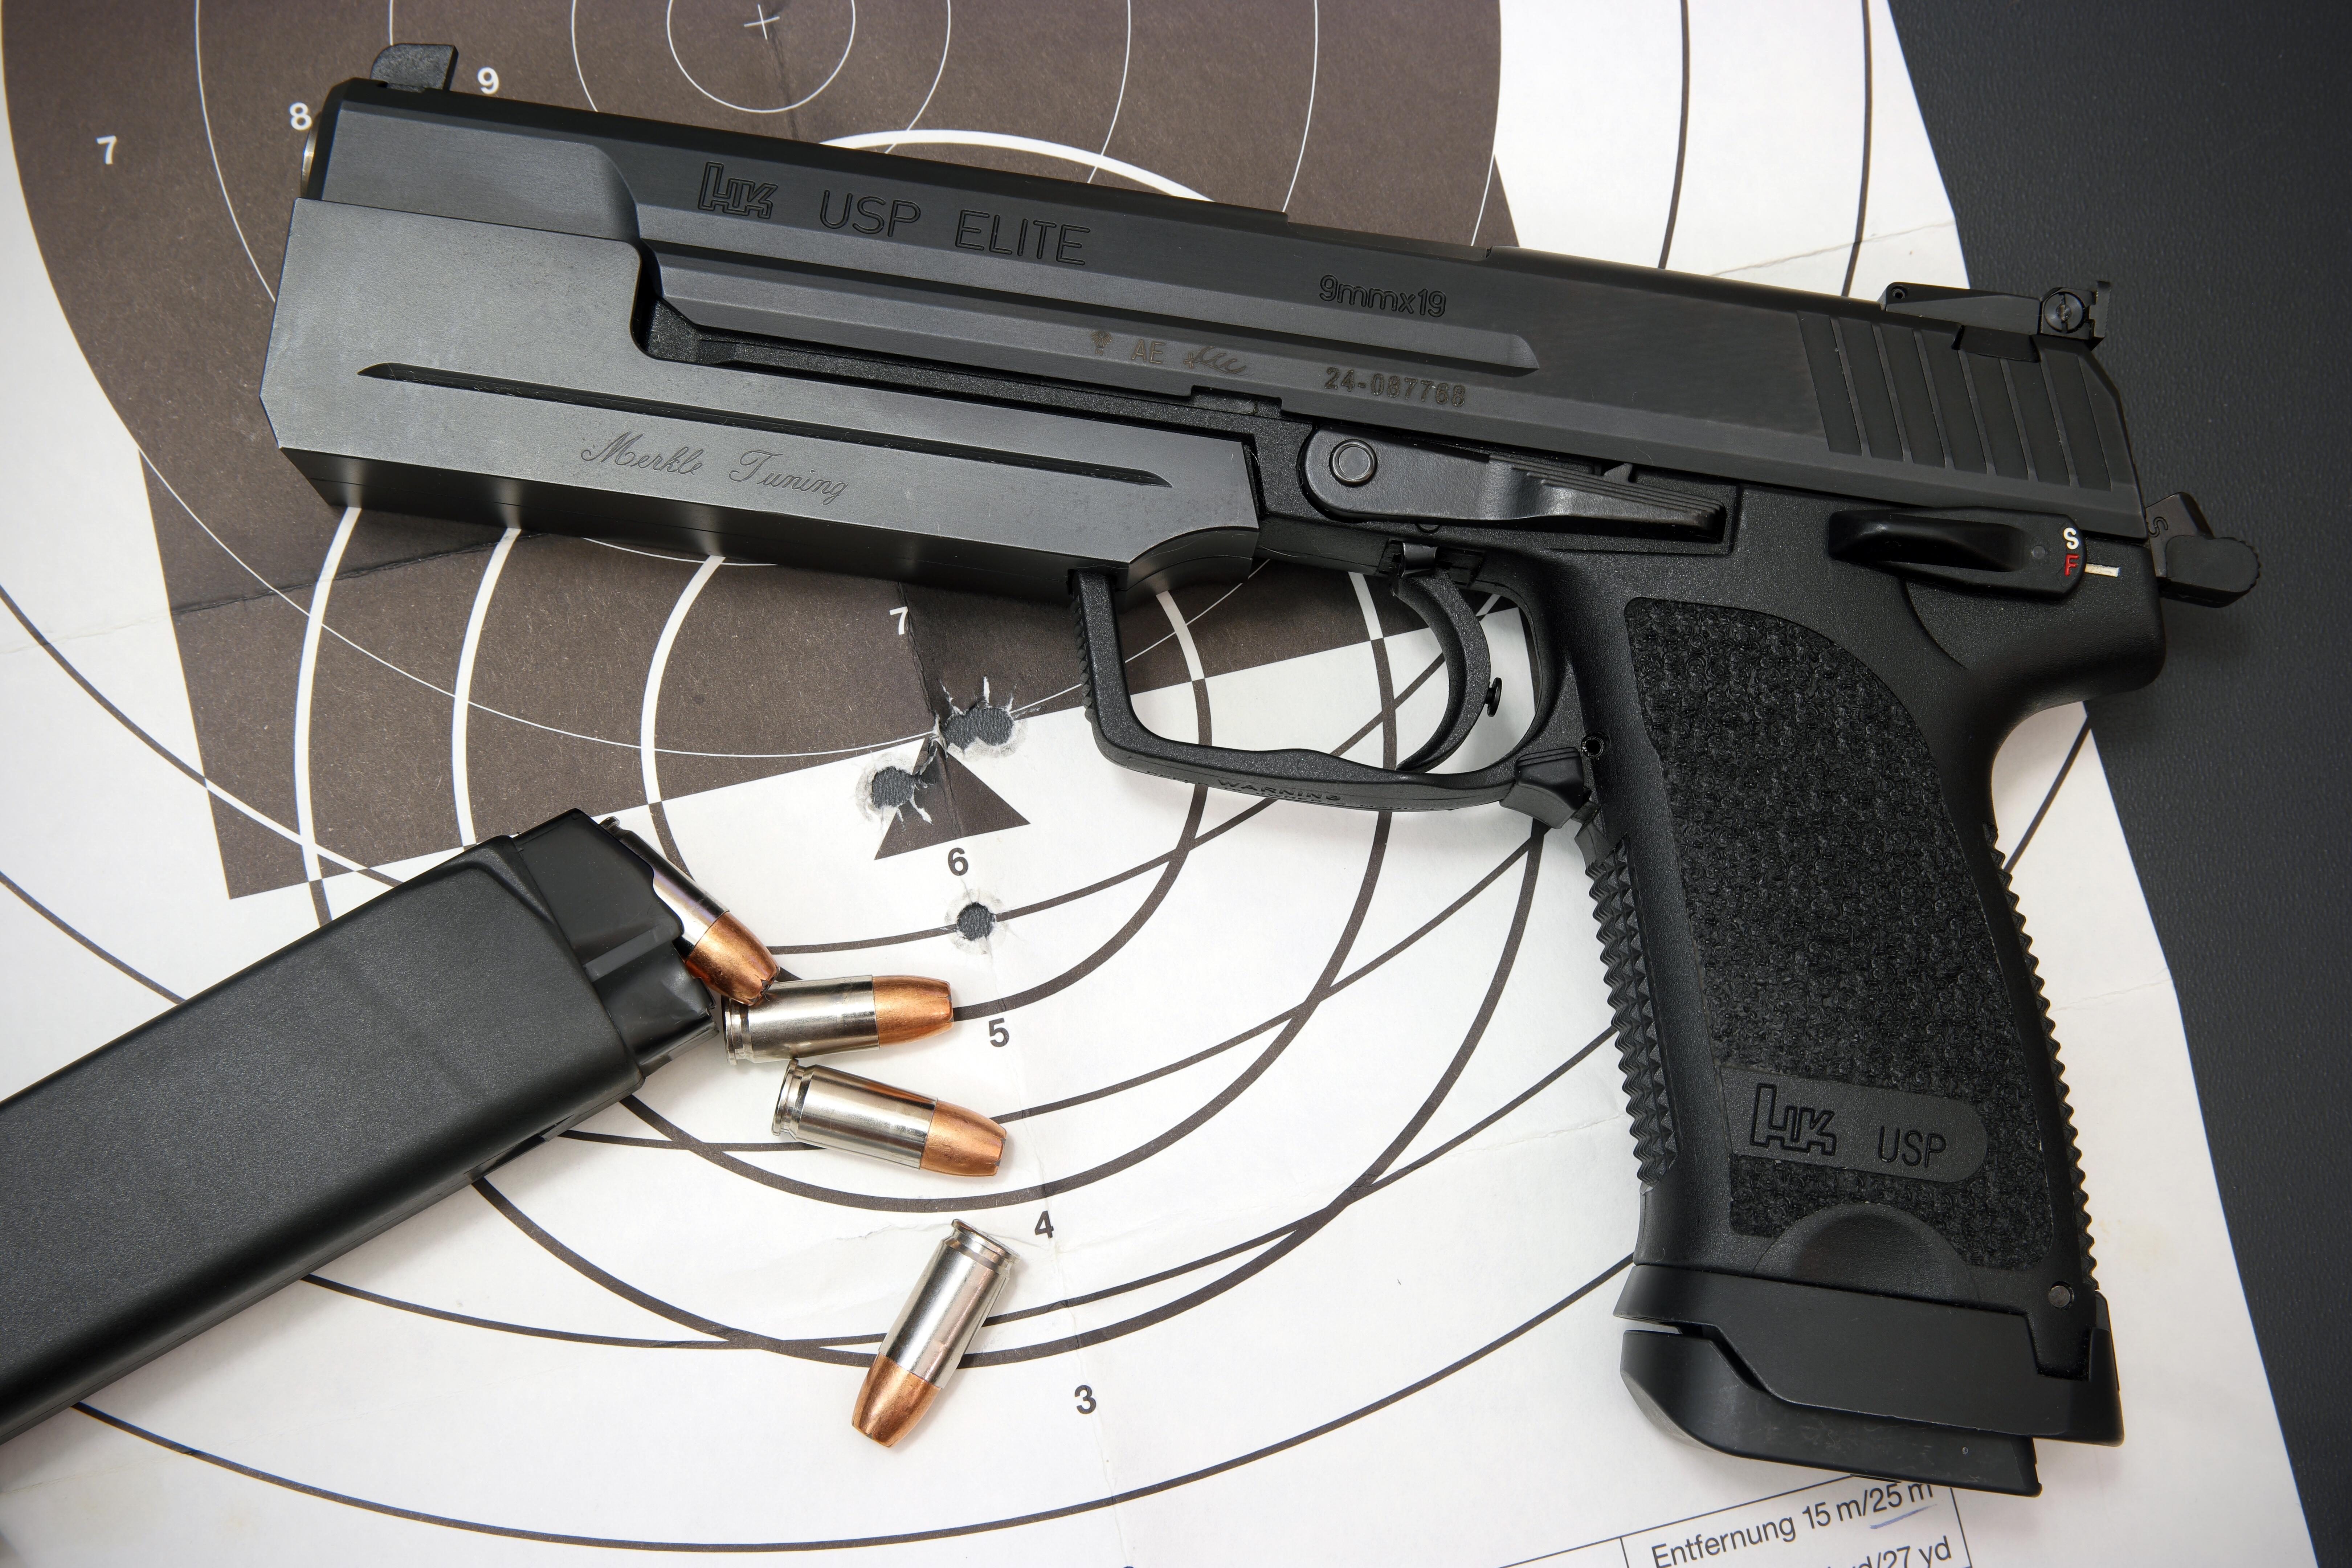 File:HK USP Elite, 9mm (21267935622).jpg - Wikimedia Commons